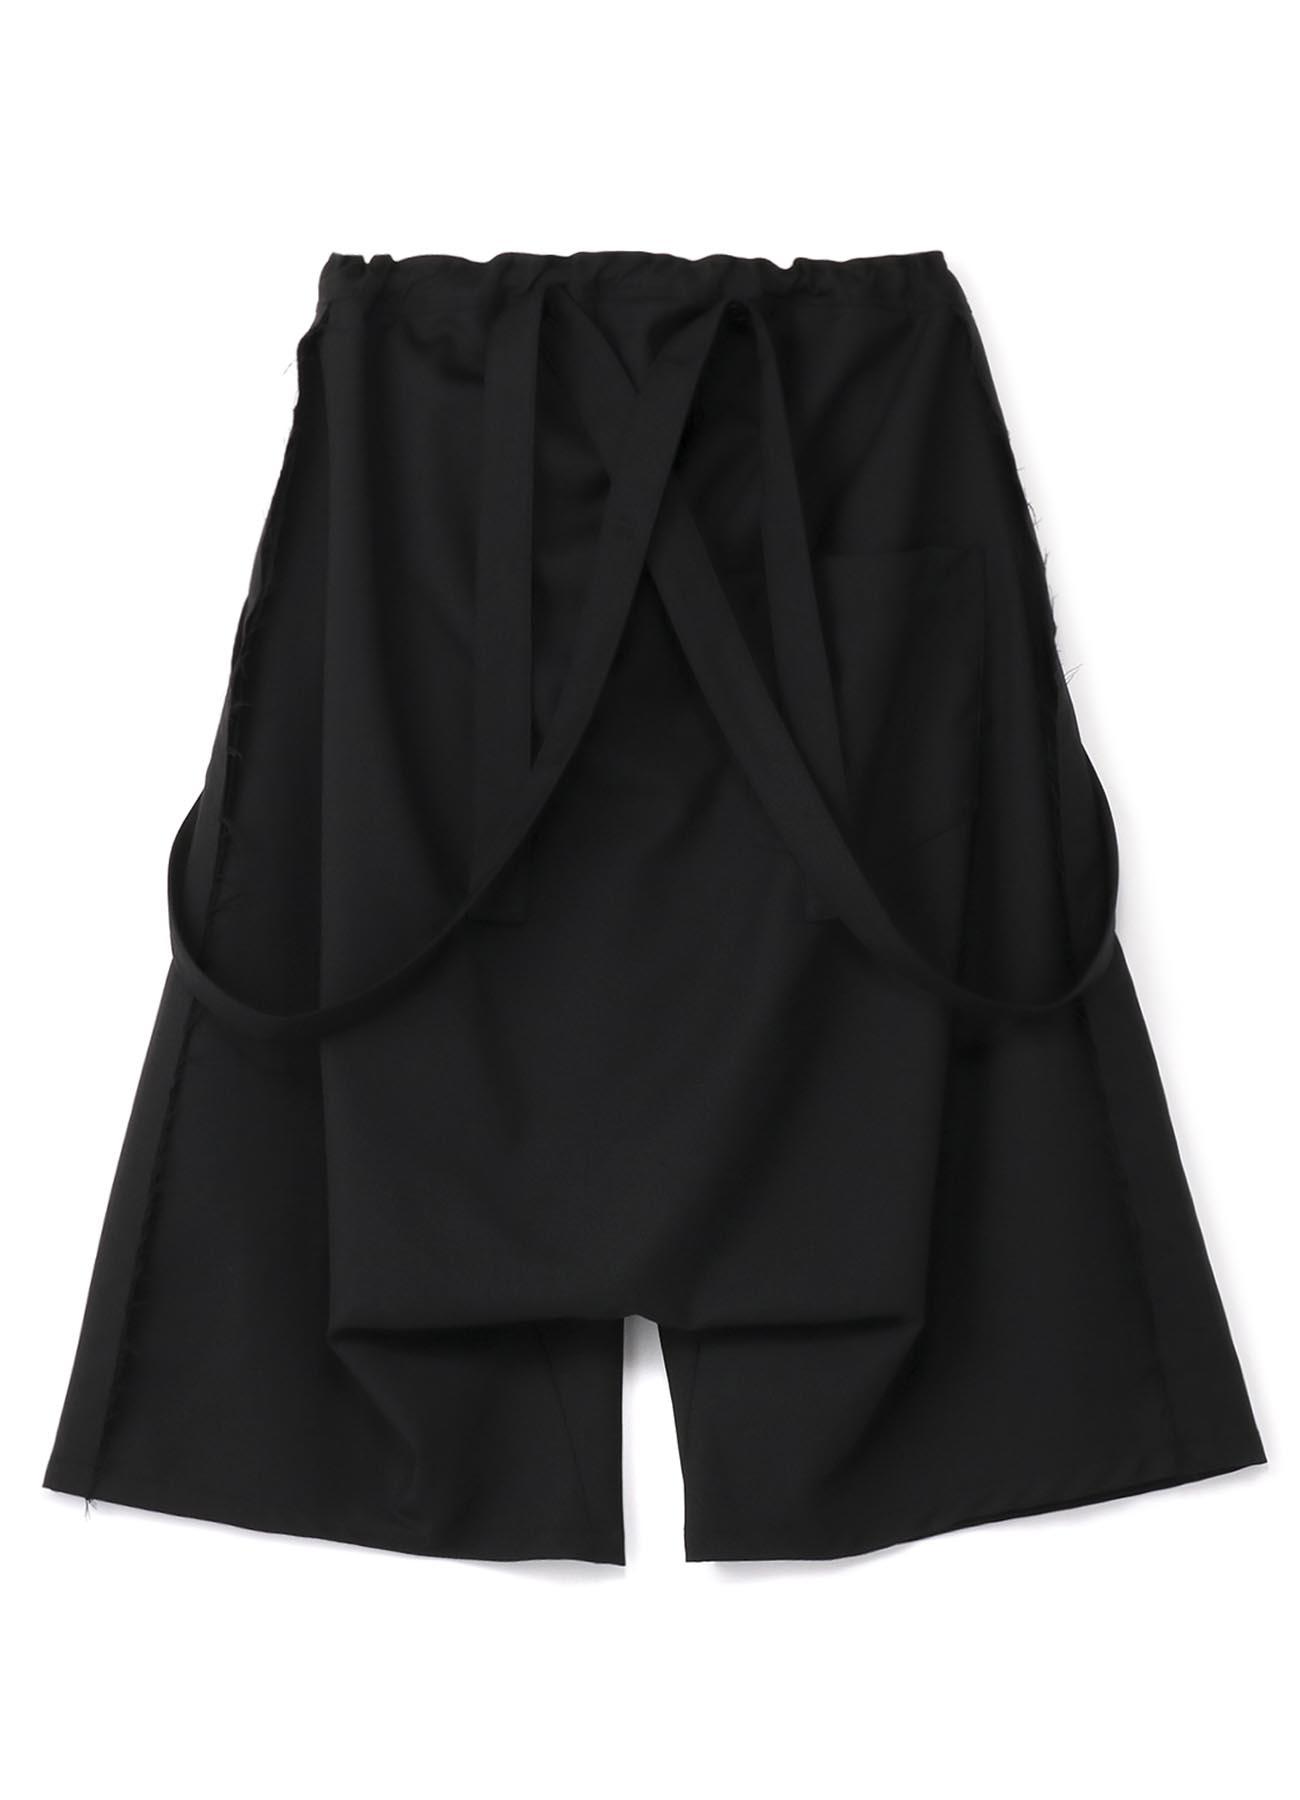 T / W?Gaberdine吊带裤Sarrouel裤子